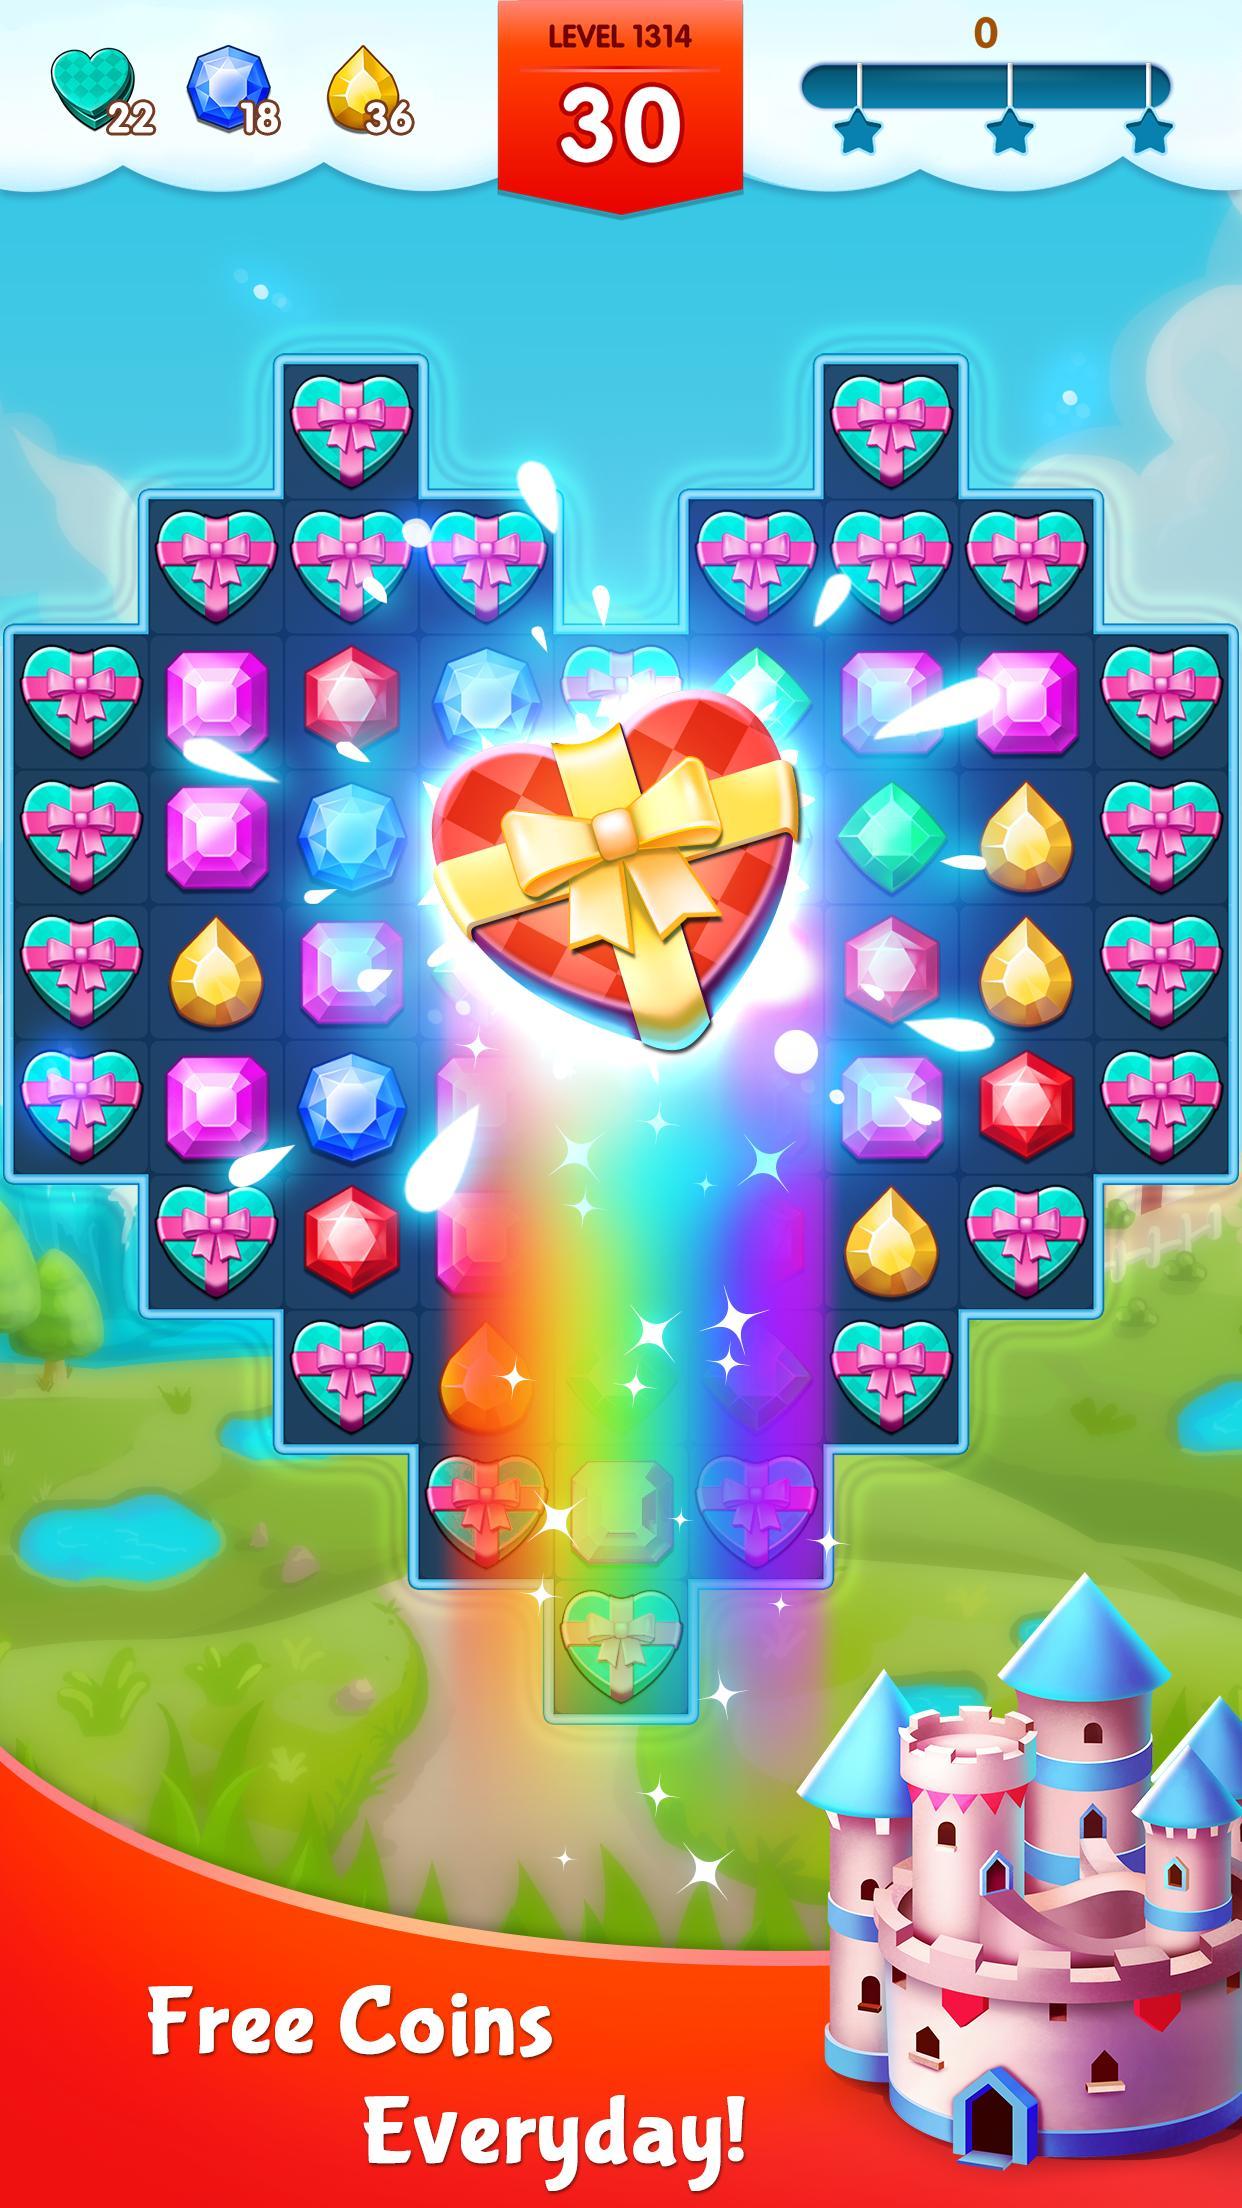 Jewels Legend - Match 3 Puzzle 2.33.3 Screenshot 5